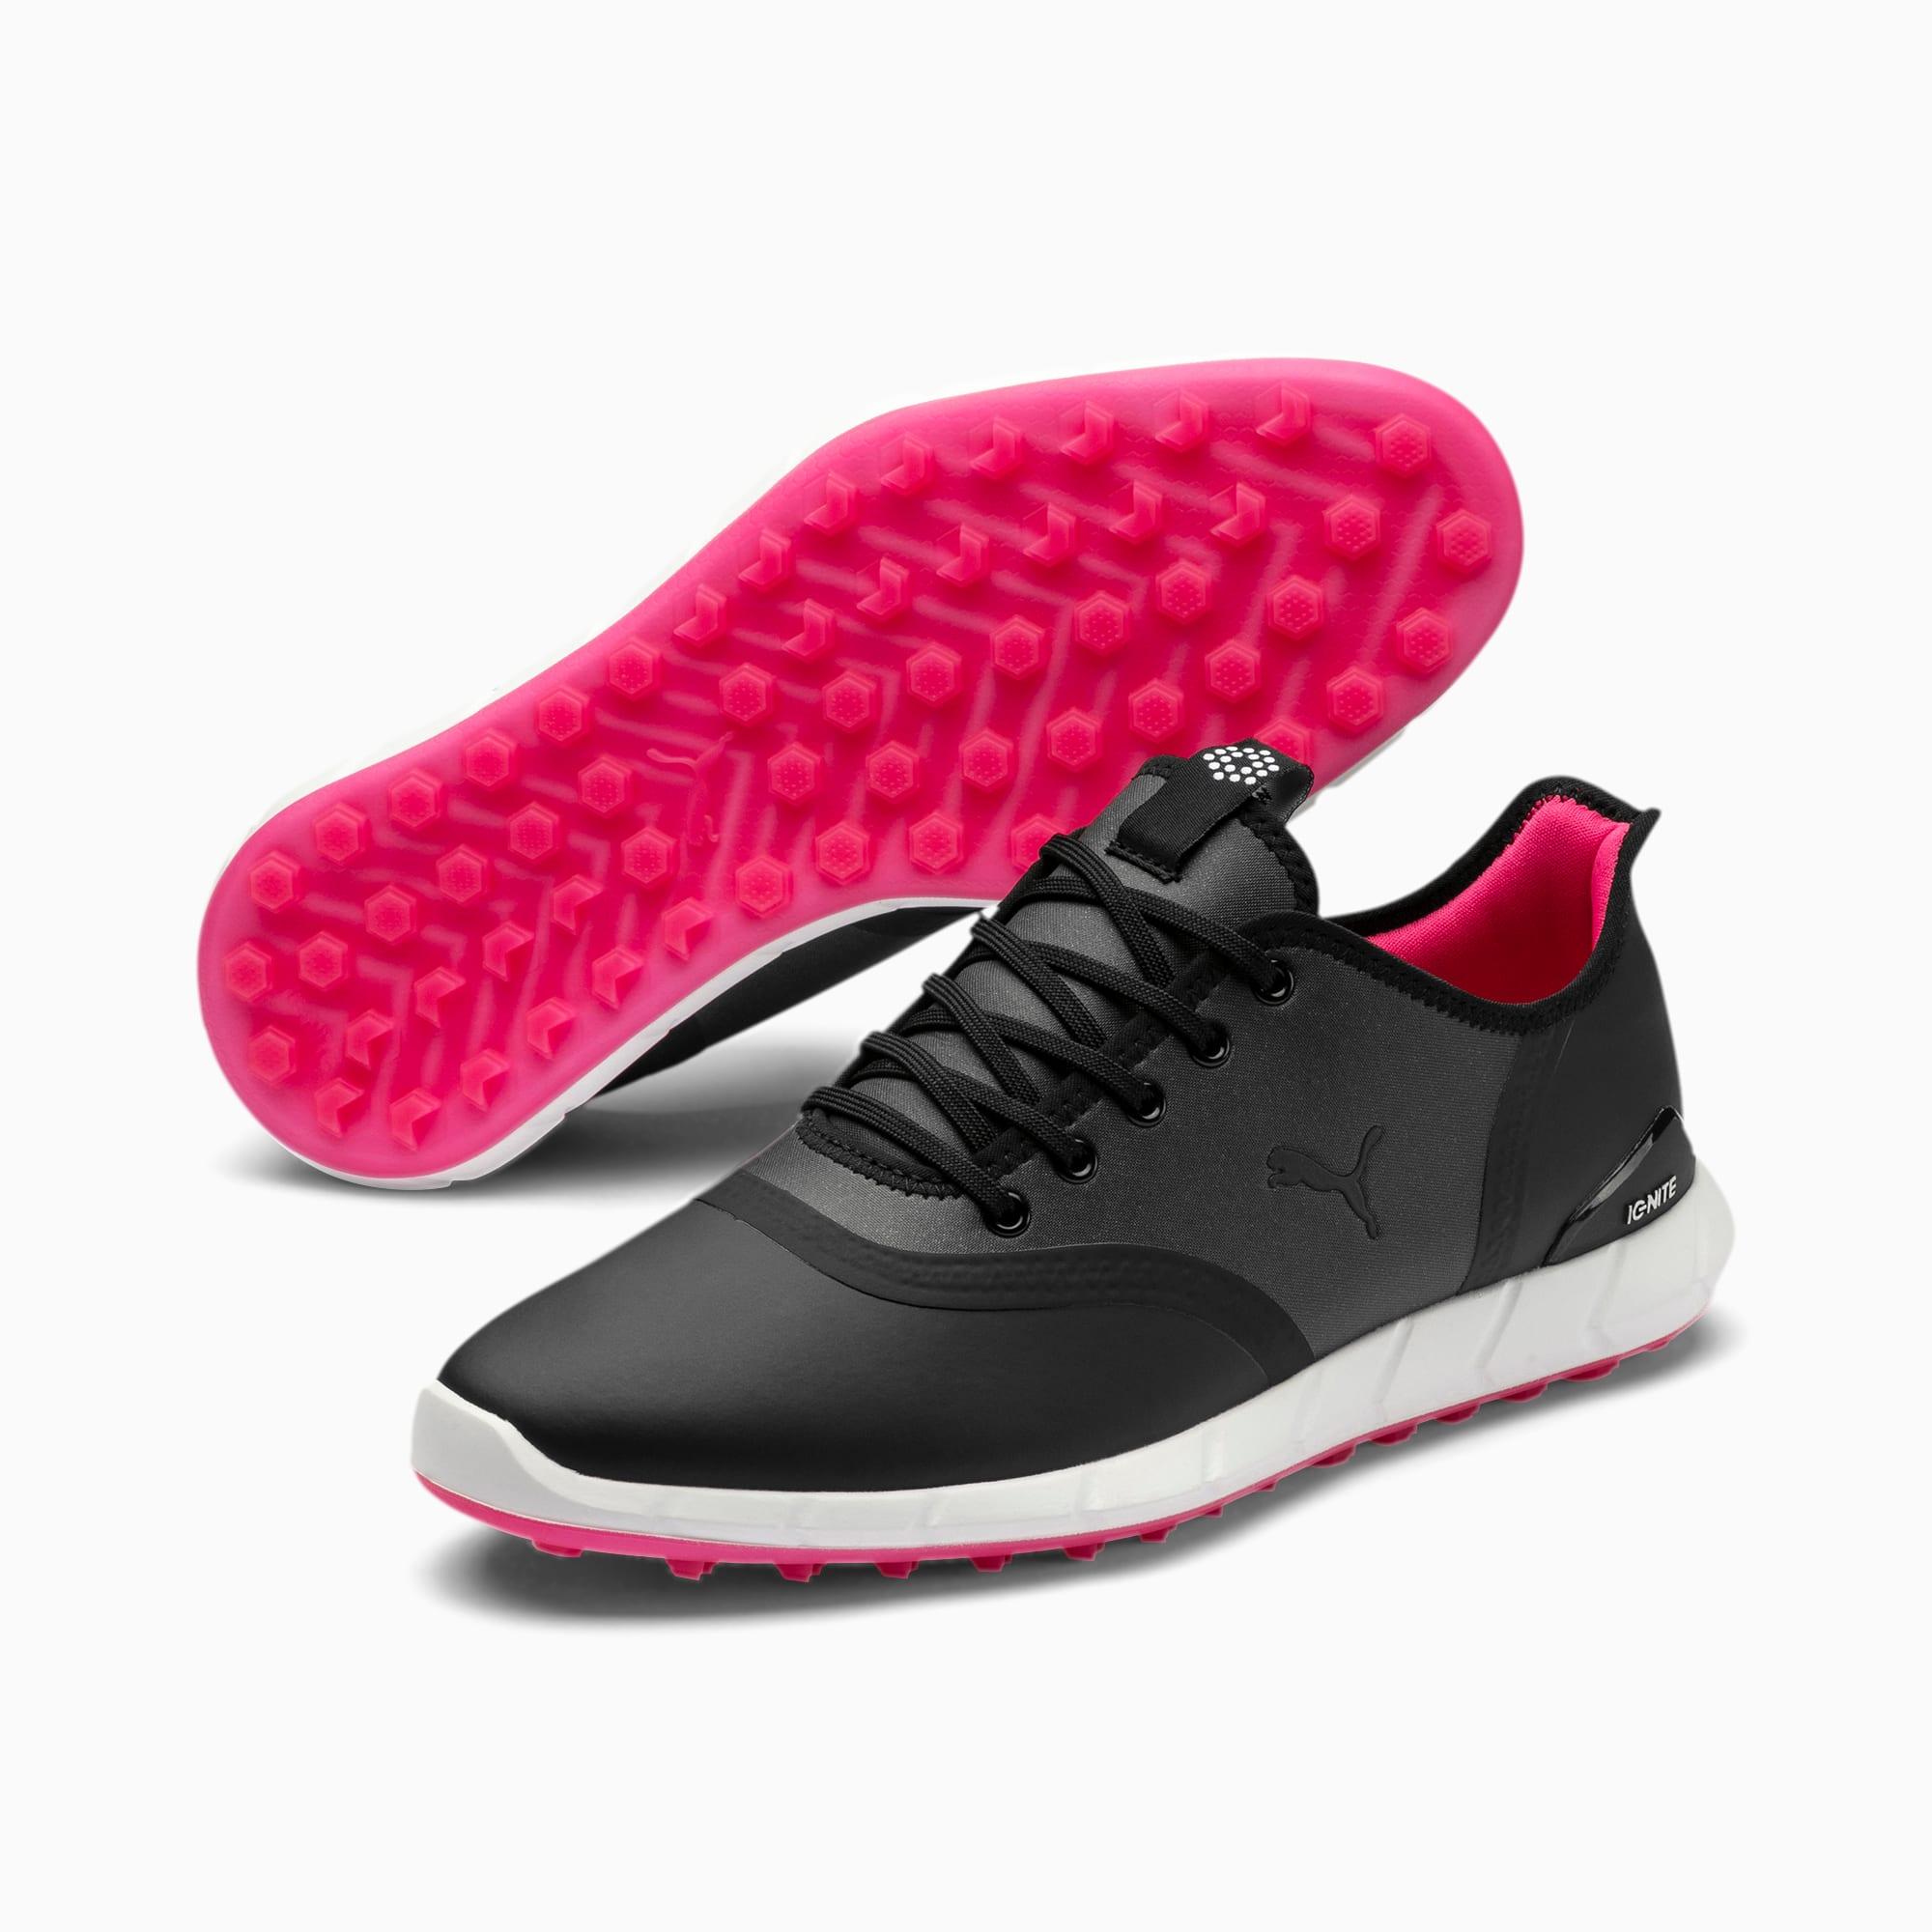 scarpe golf puma donna